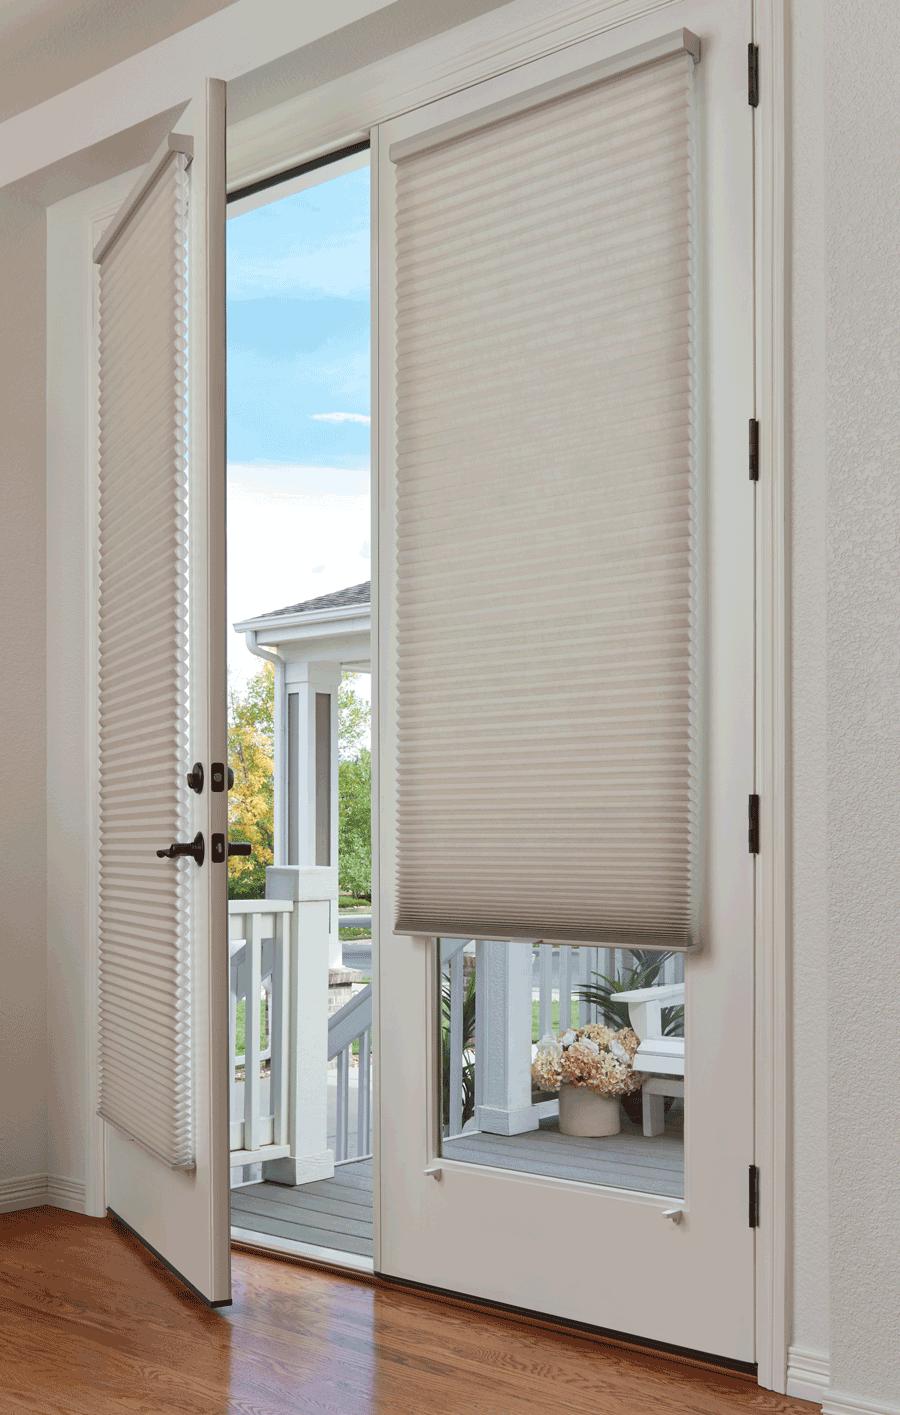 Glass Door Window Treatments Duette Shades French Doors